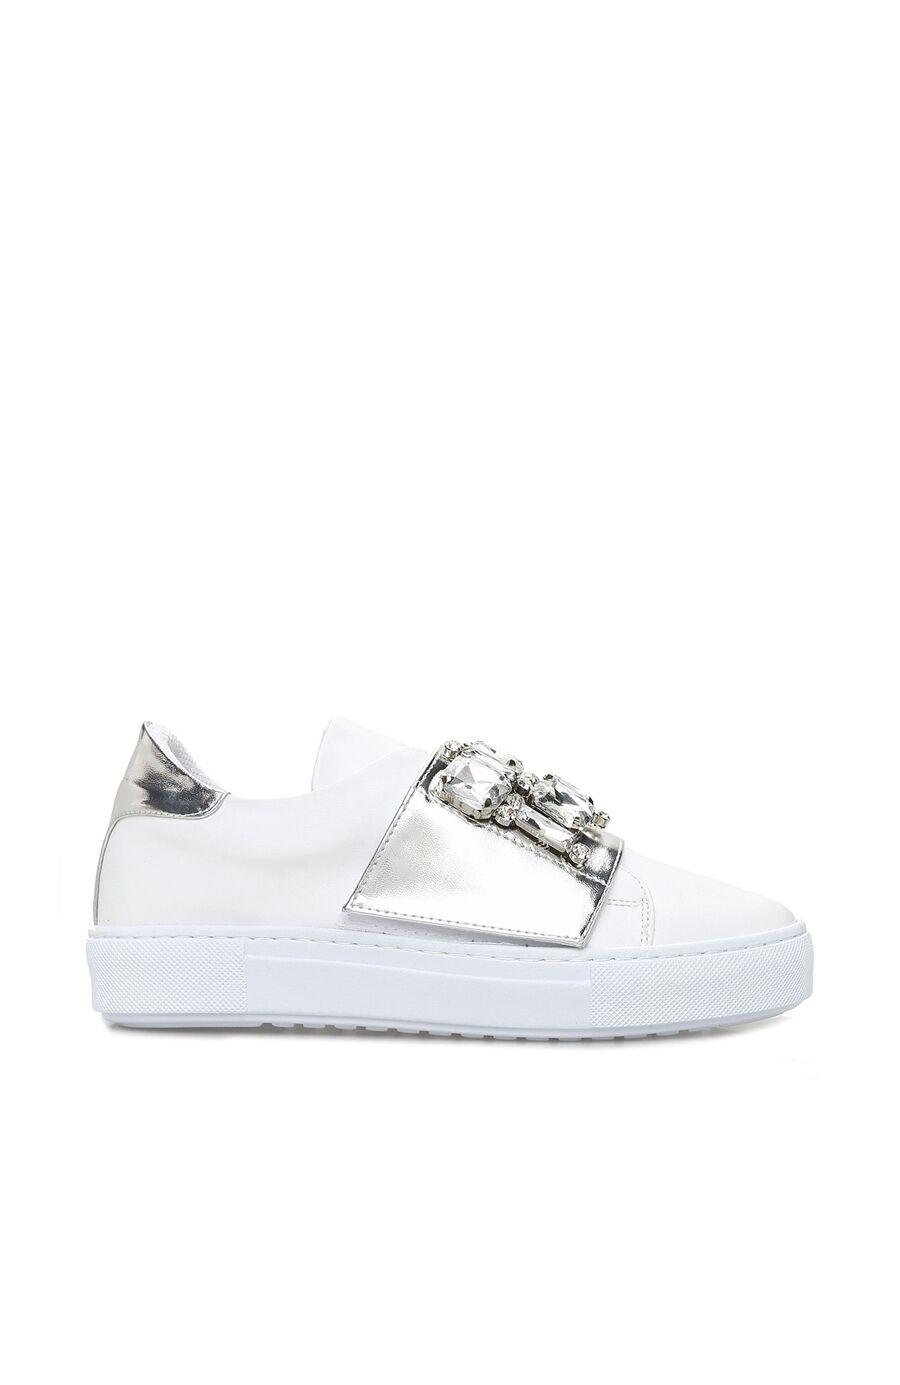 Gıro Taşlı Beyaz Sneaker – 399.0 TL